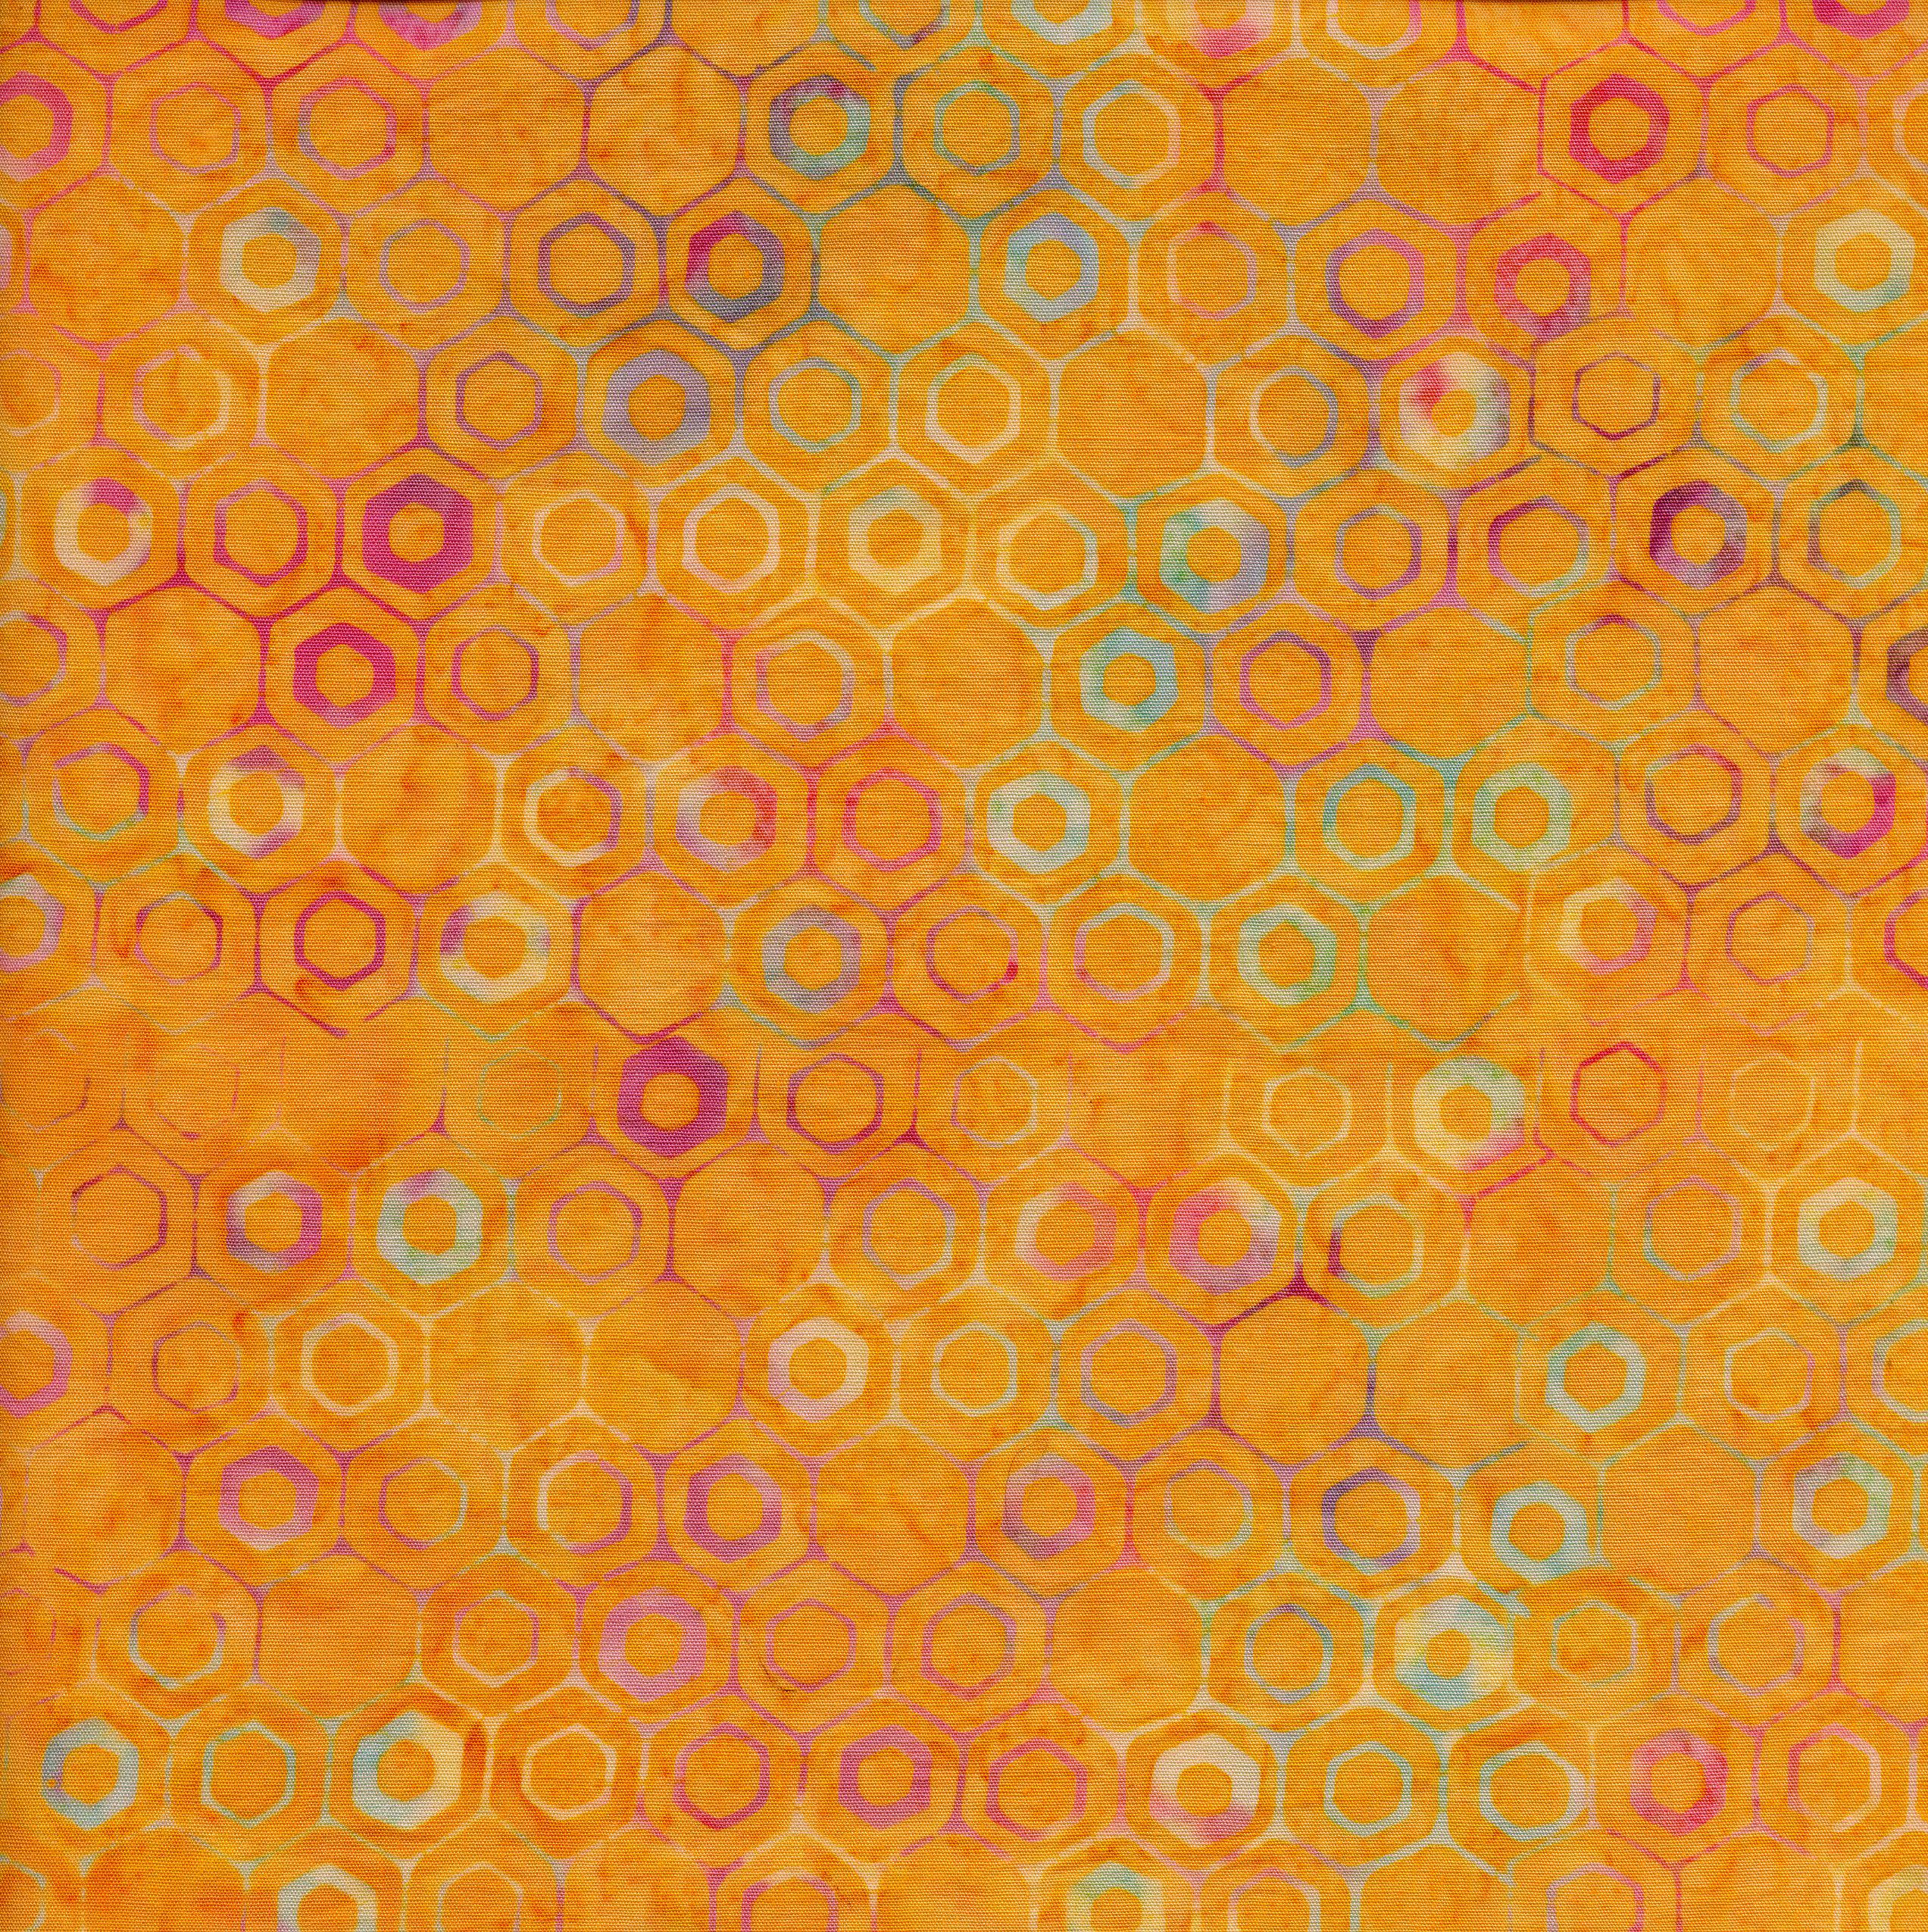 111810150 / Honeycomb-Cheddar